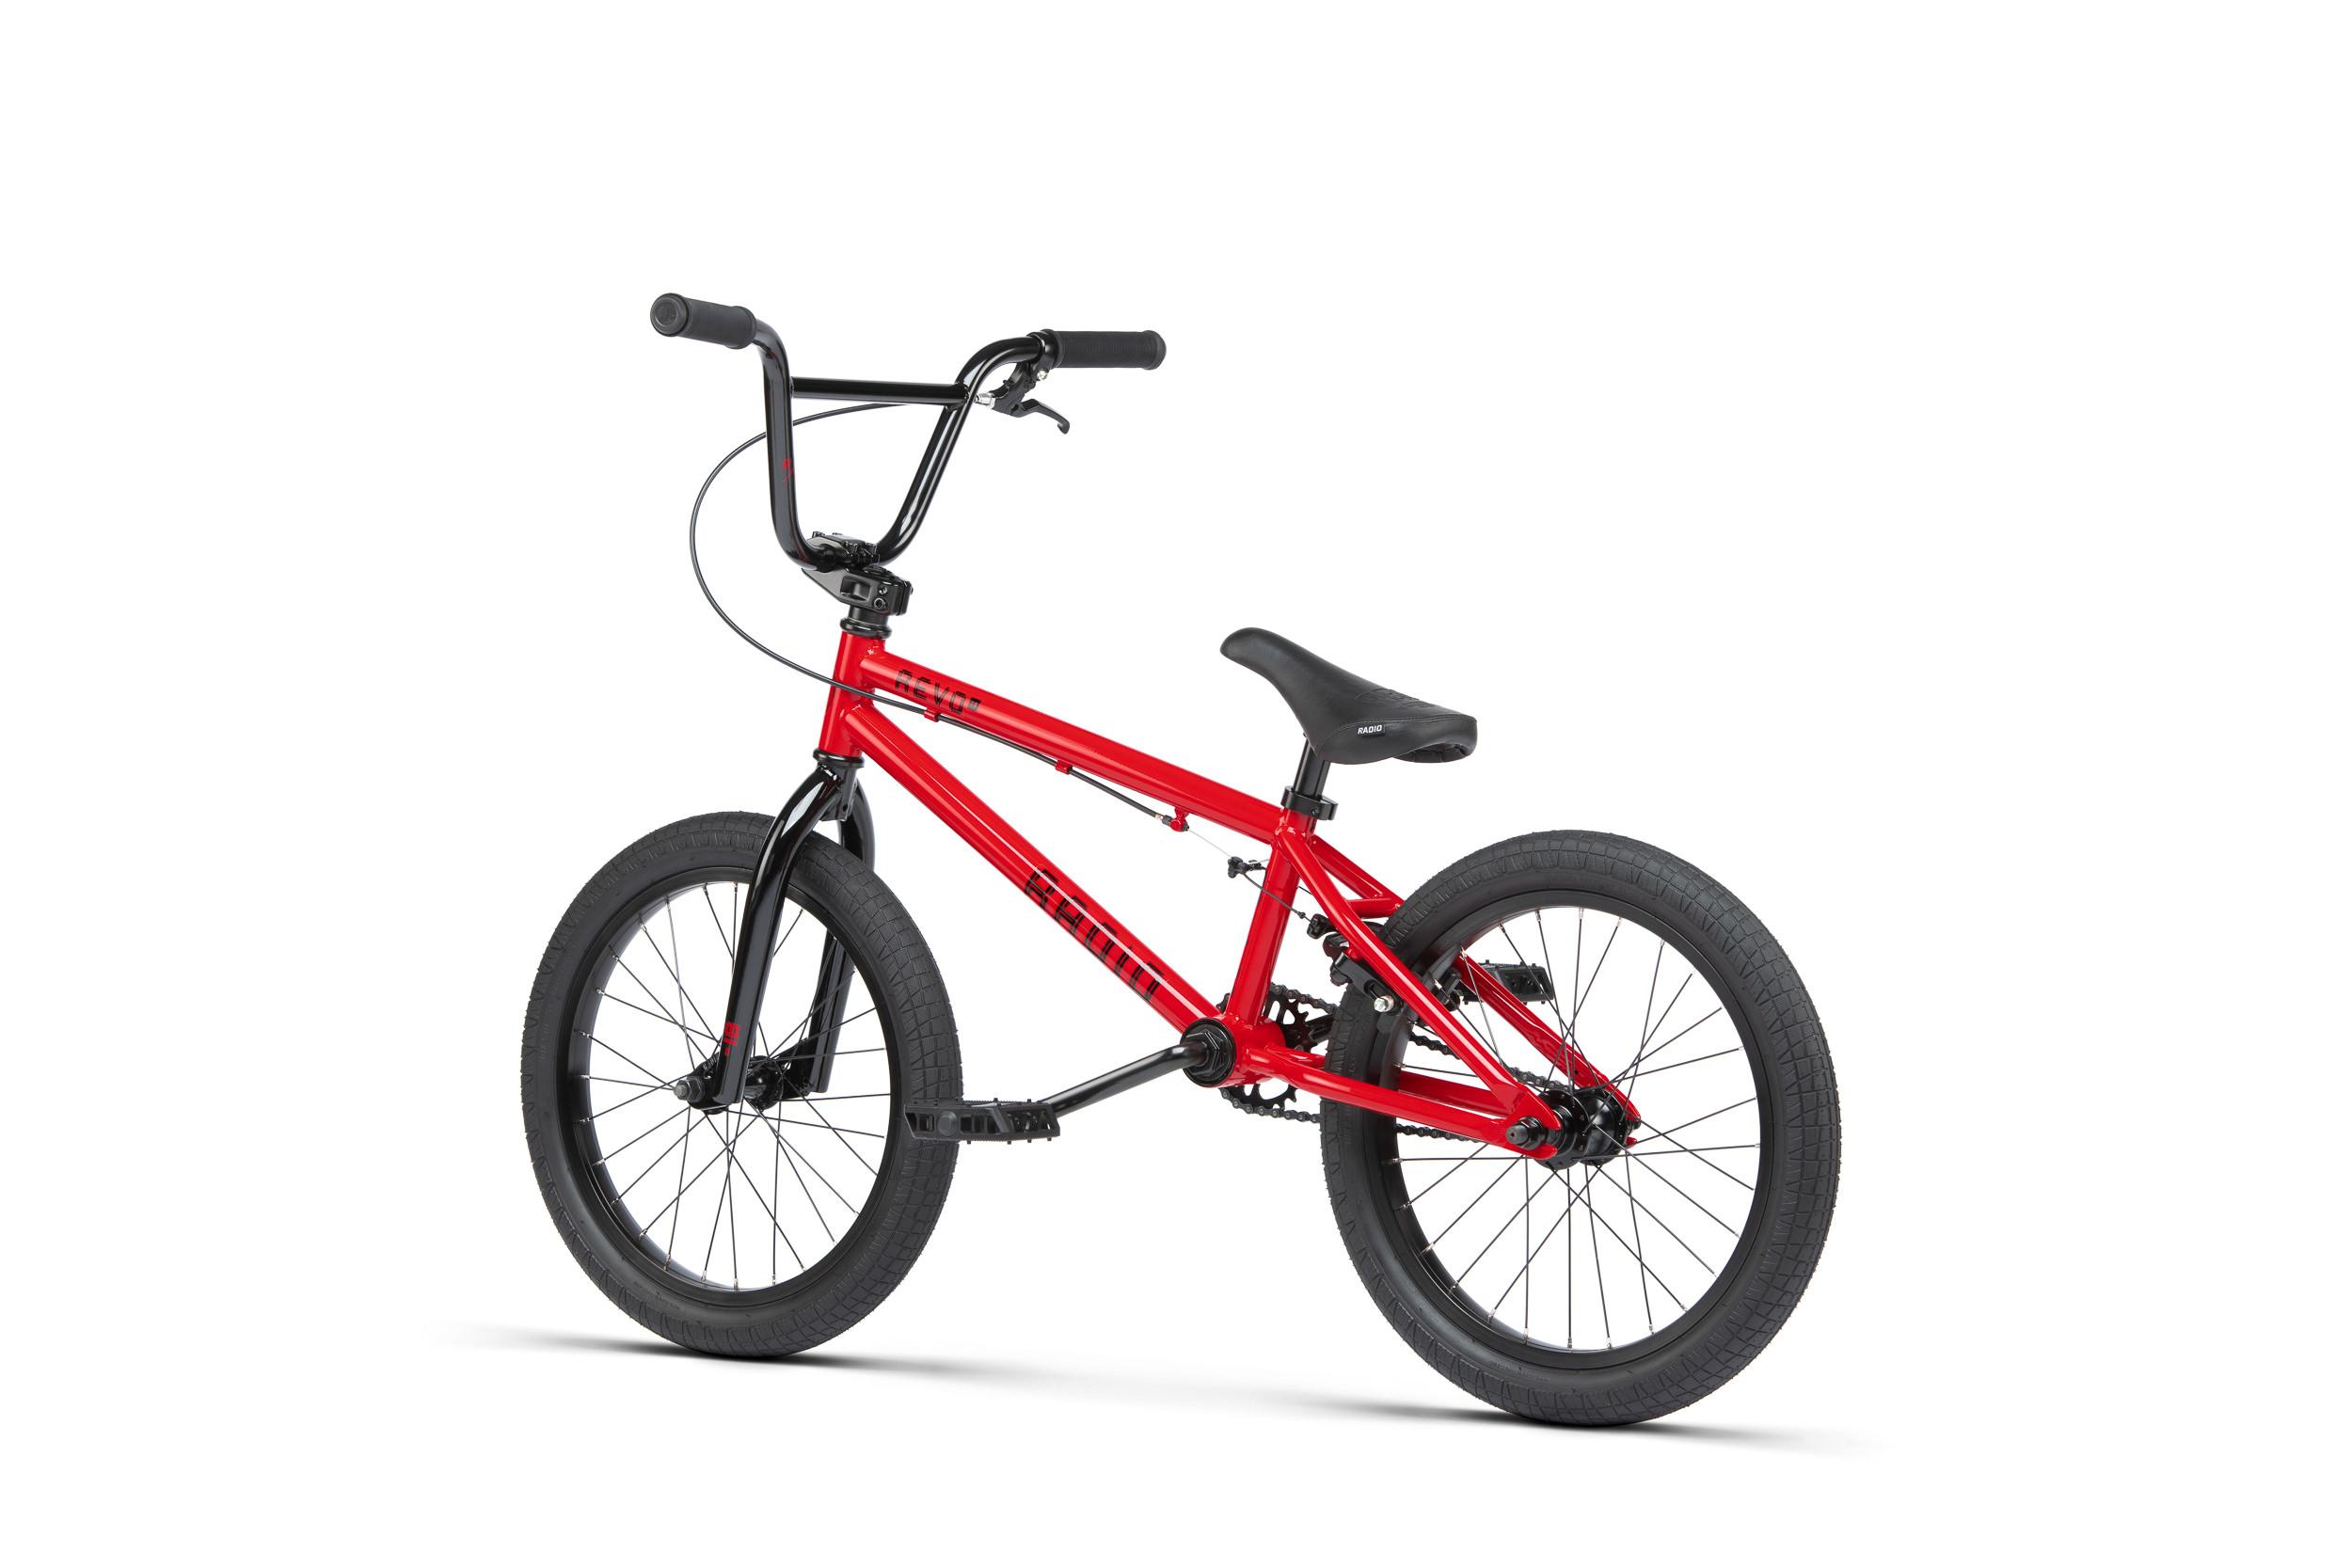 Salt Bicycle Cycle Bike OPC BMX Crank Black